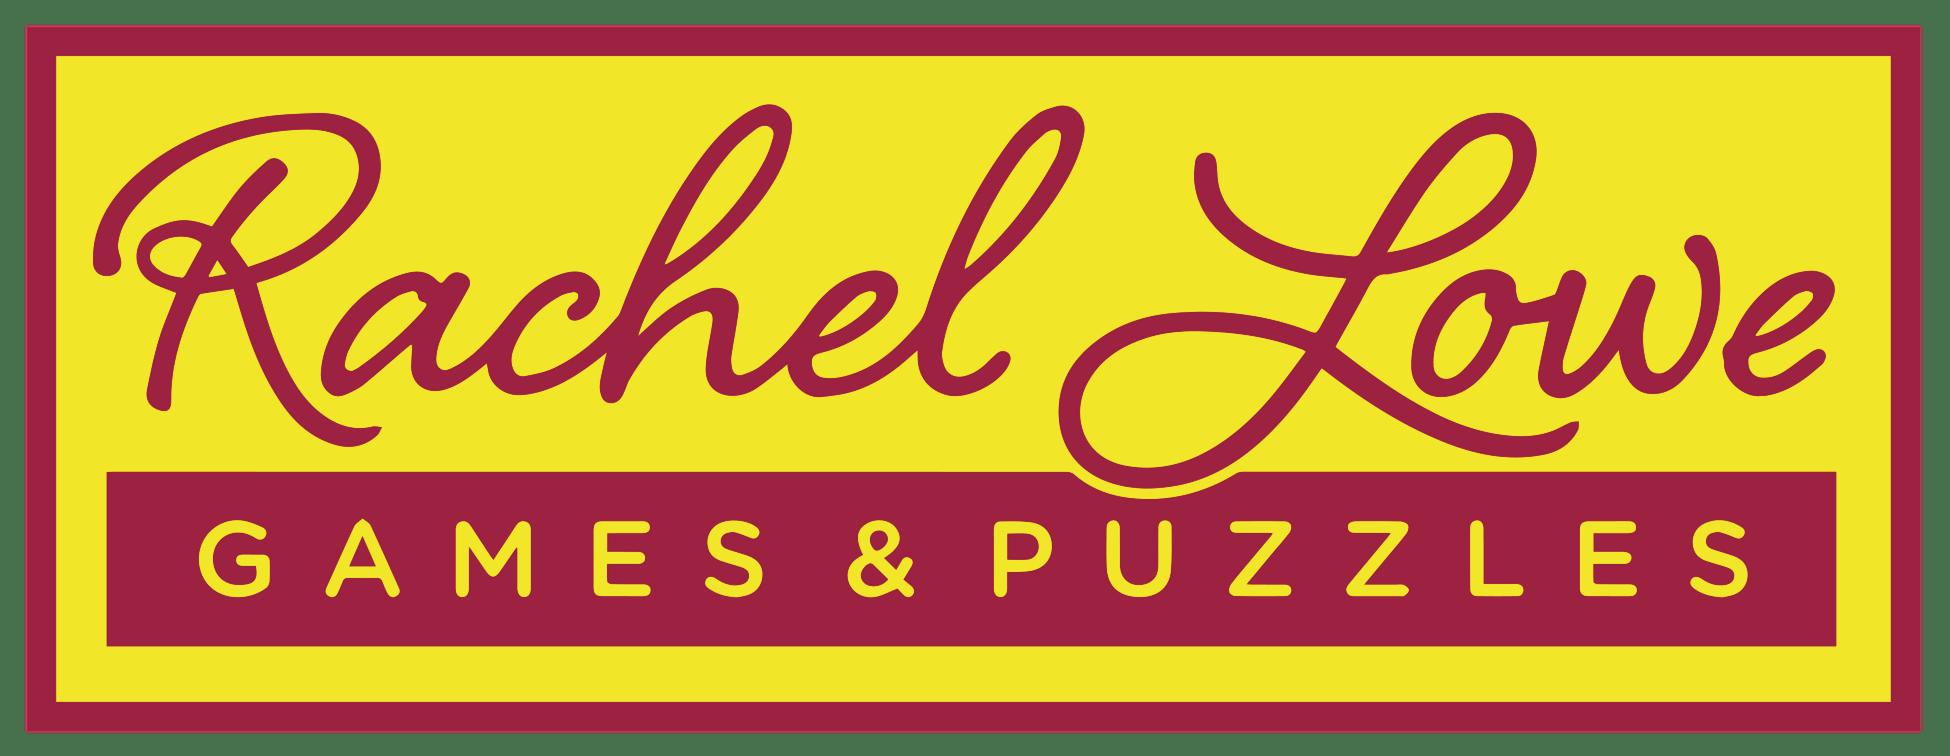 Rachel Lowe Games & Puzzles